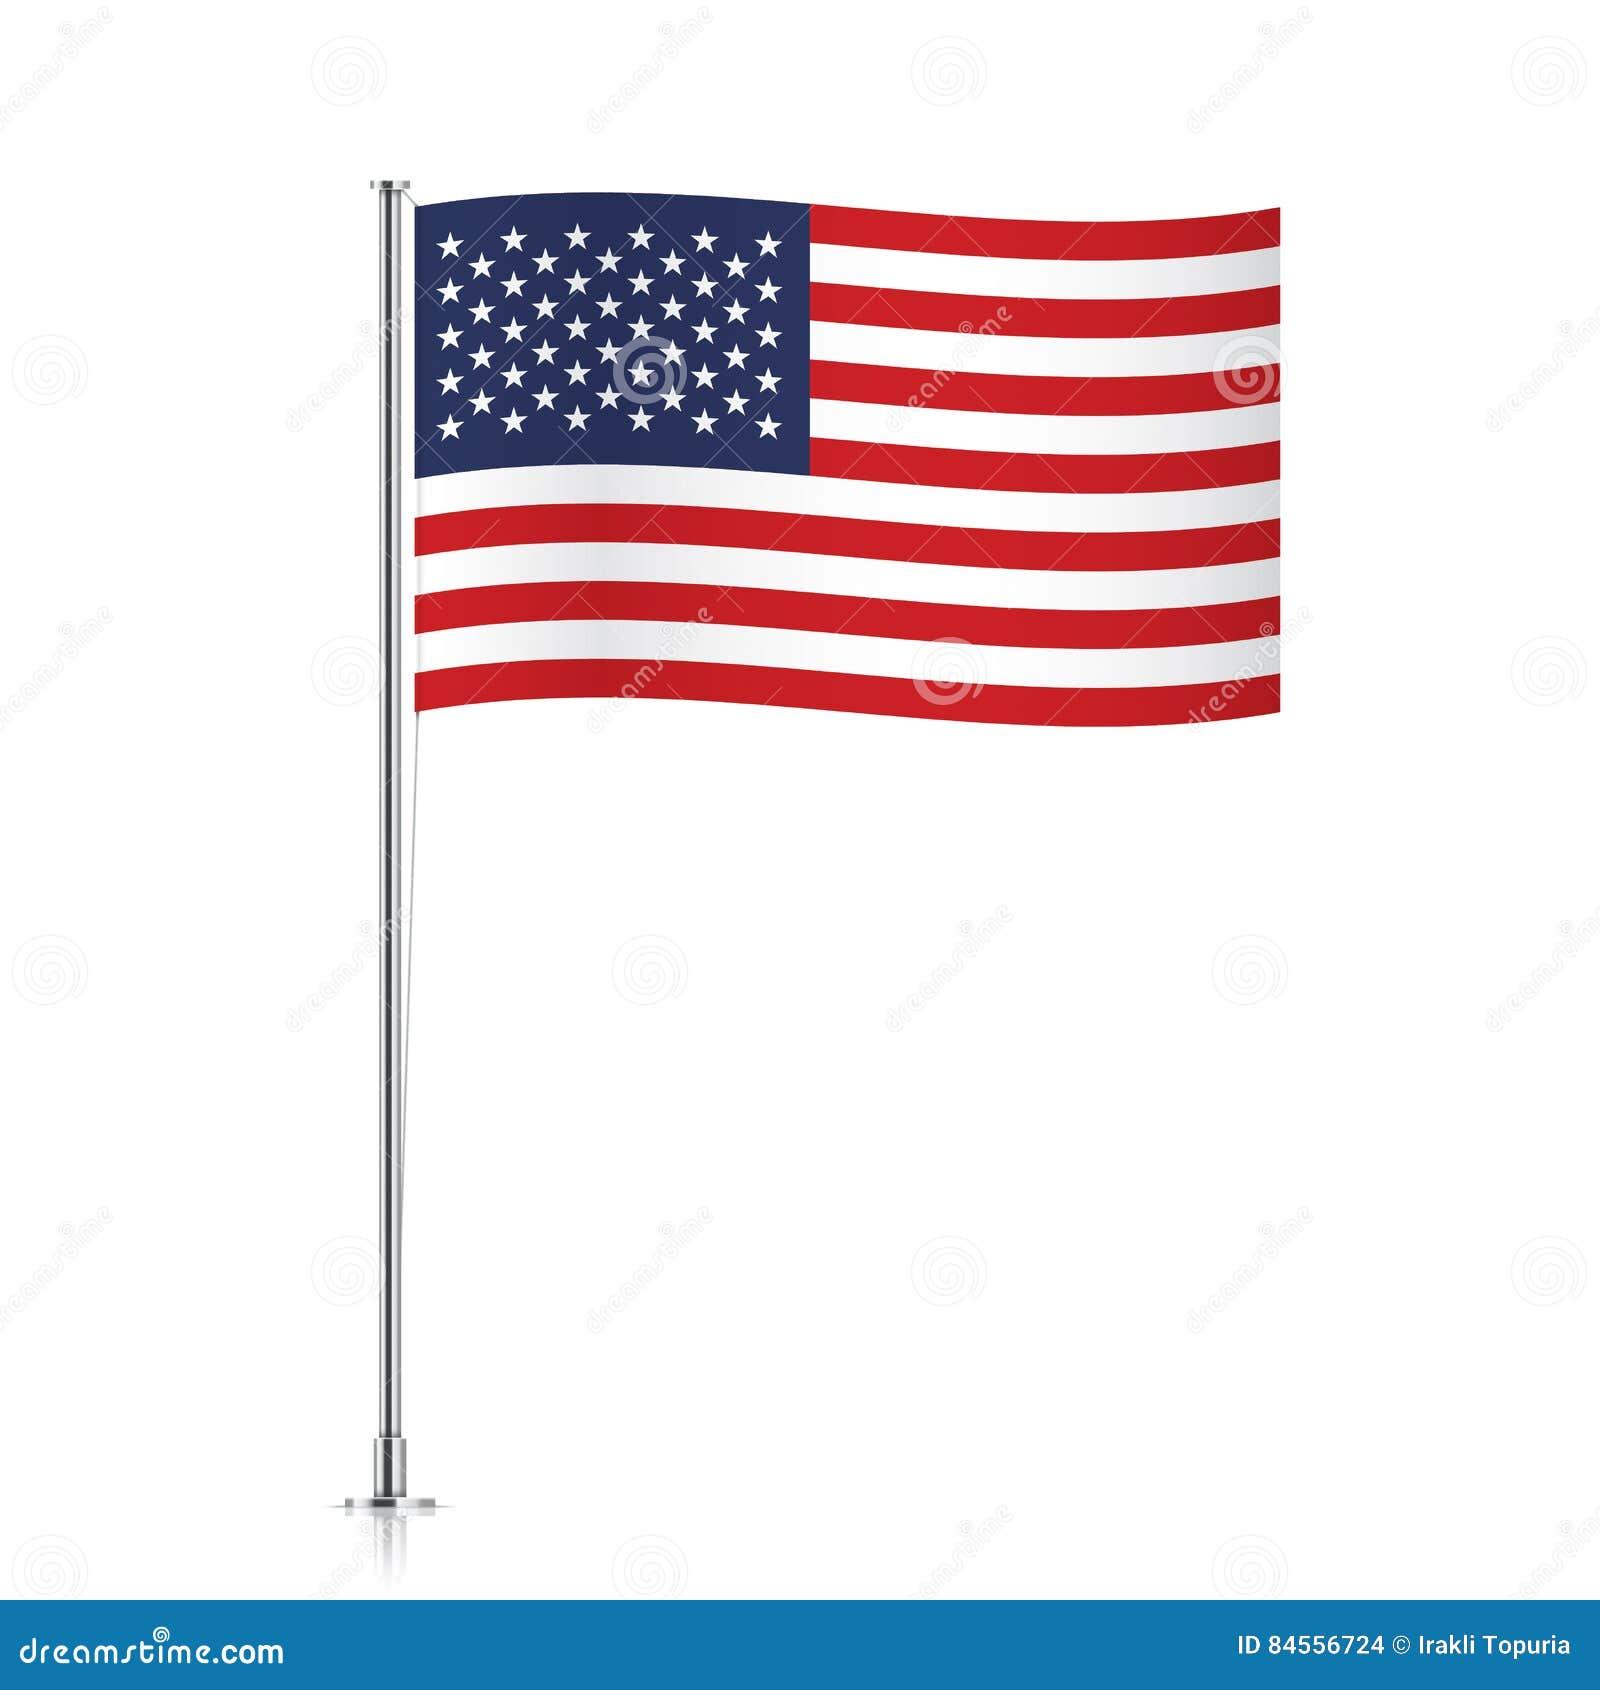 a5ee7603f65 USA Flag Waving On A Metallic Pole. Stock Vector - Illustration of ...